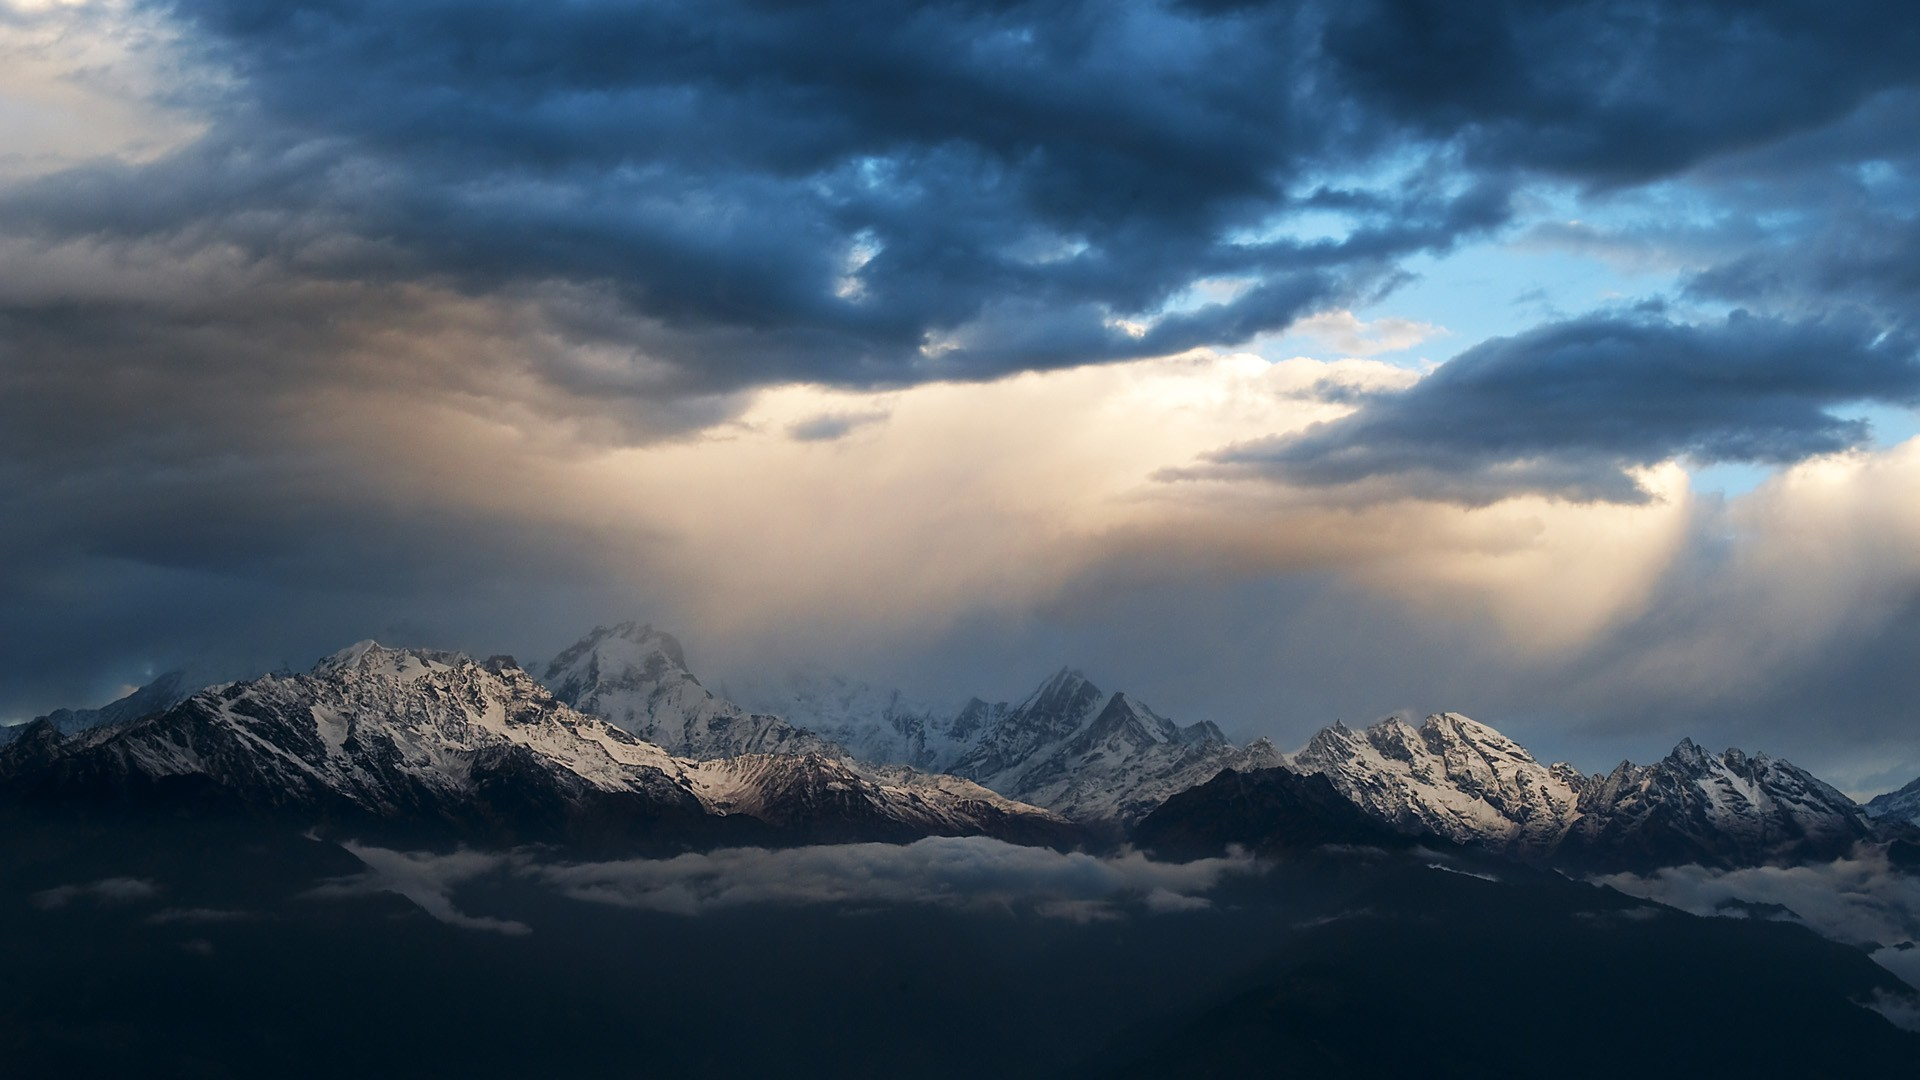 Sunrise mountains nepal himalaya wallpaper 1920x1080 - Himalaya pictures wallpaper ...